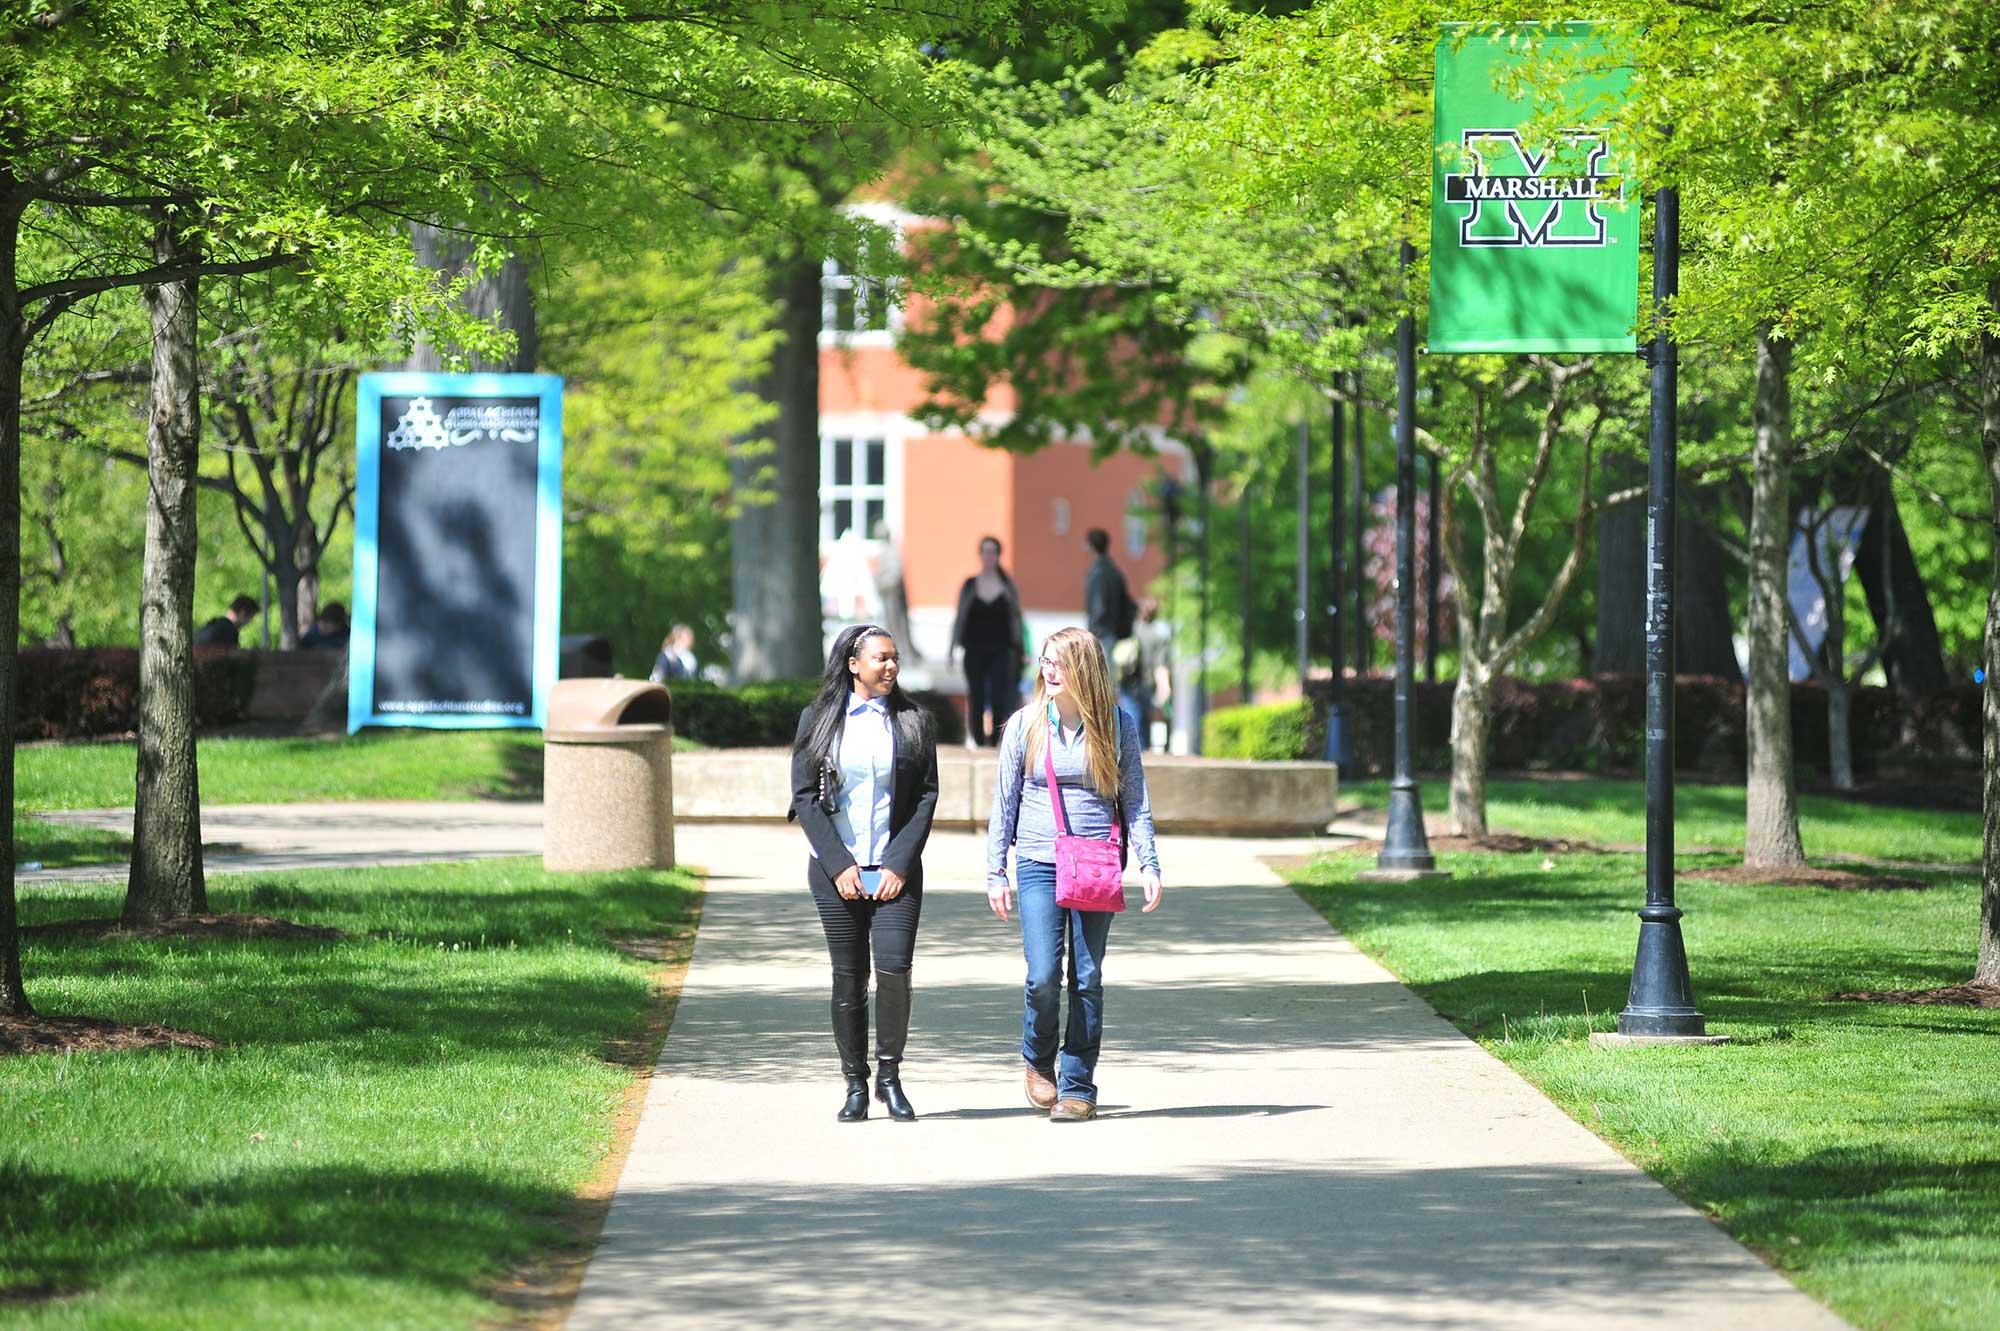 INTO Marshall students walking campus